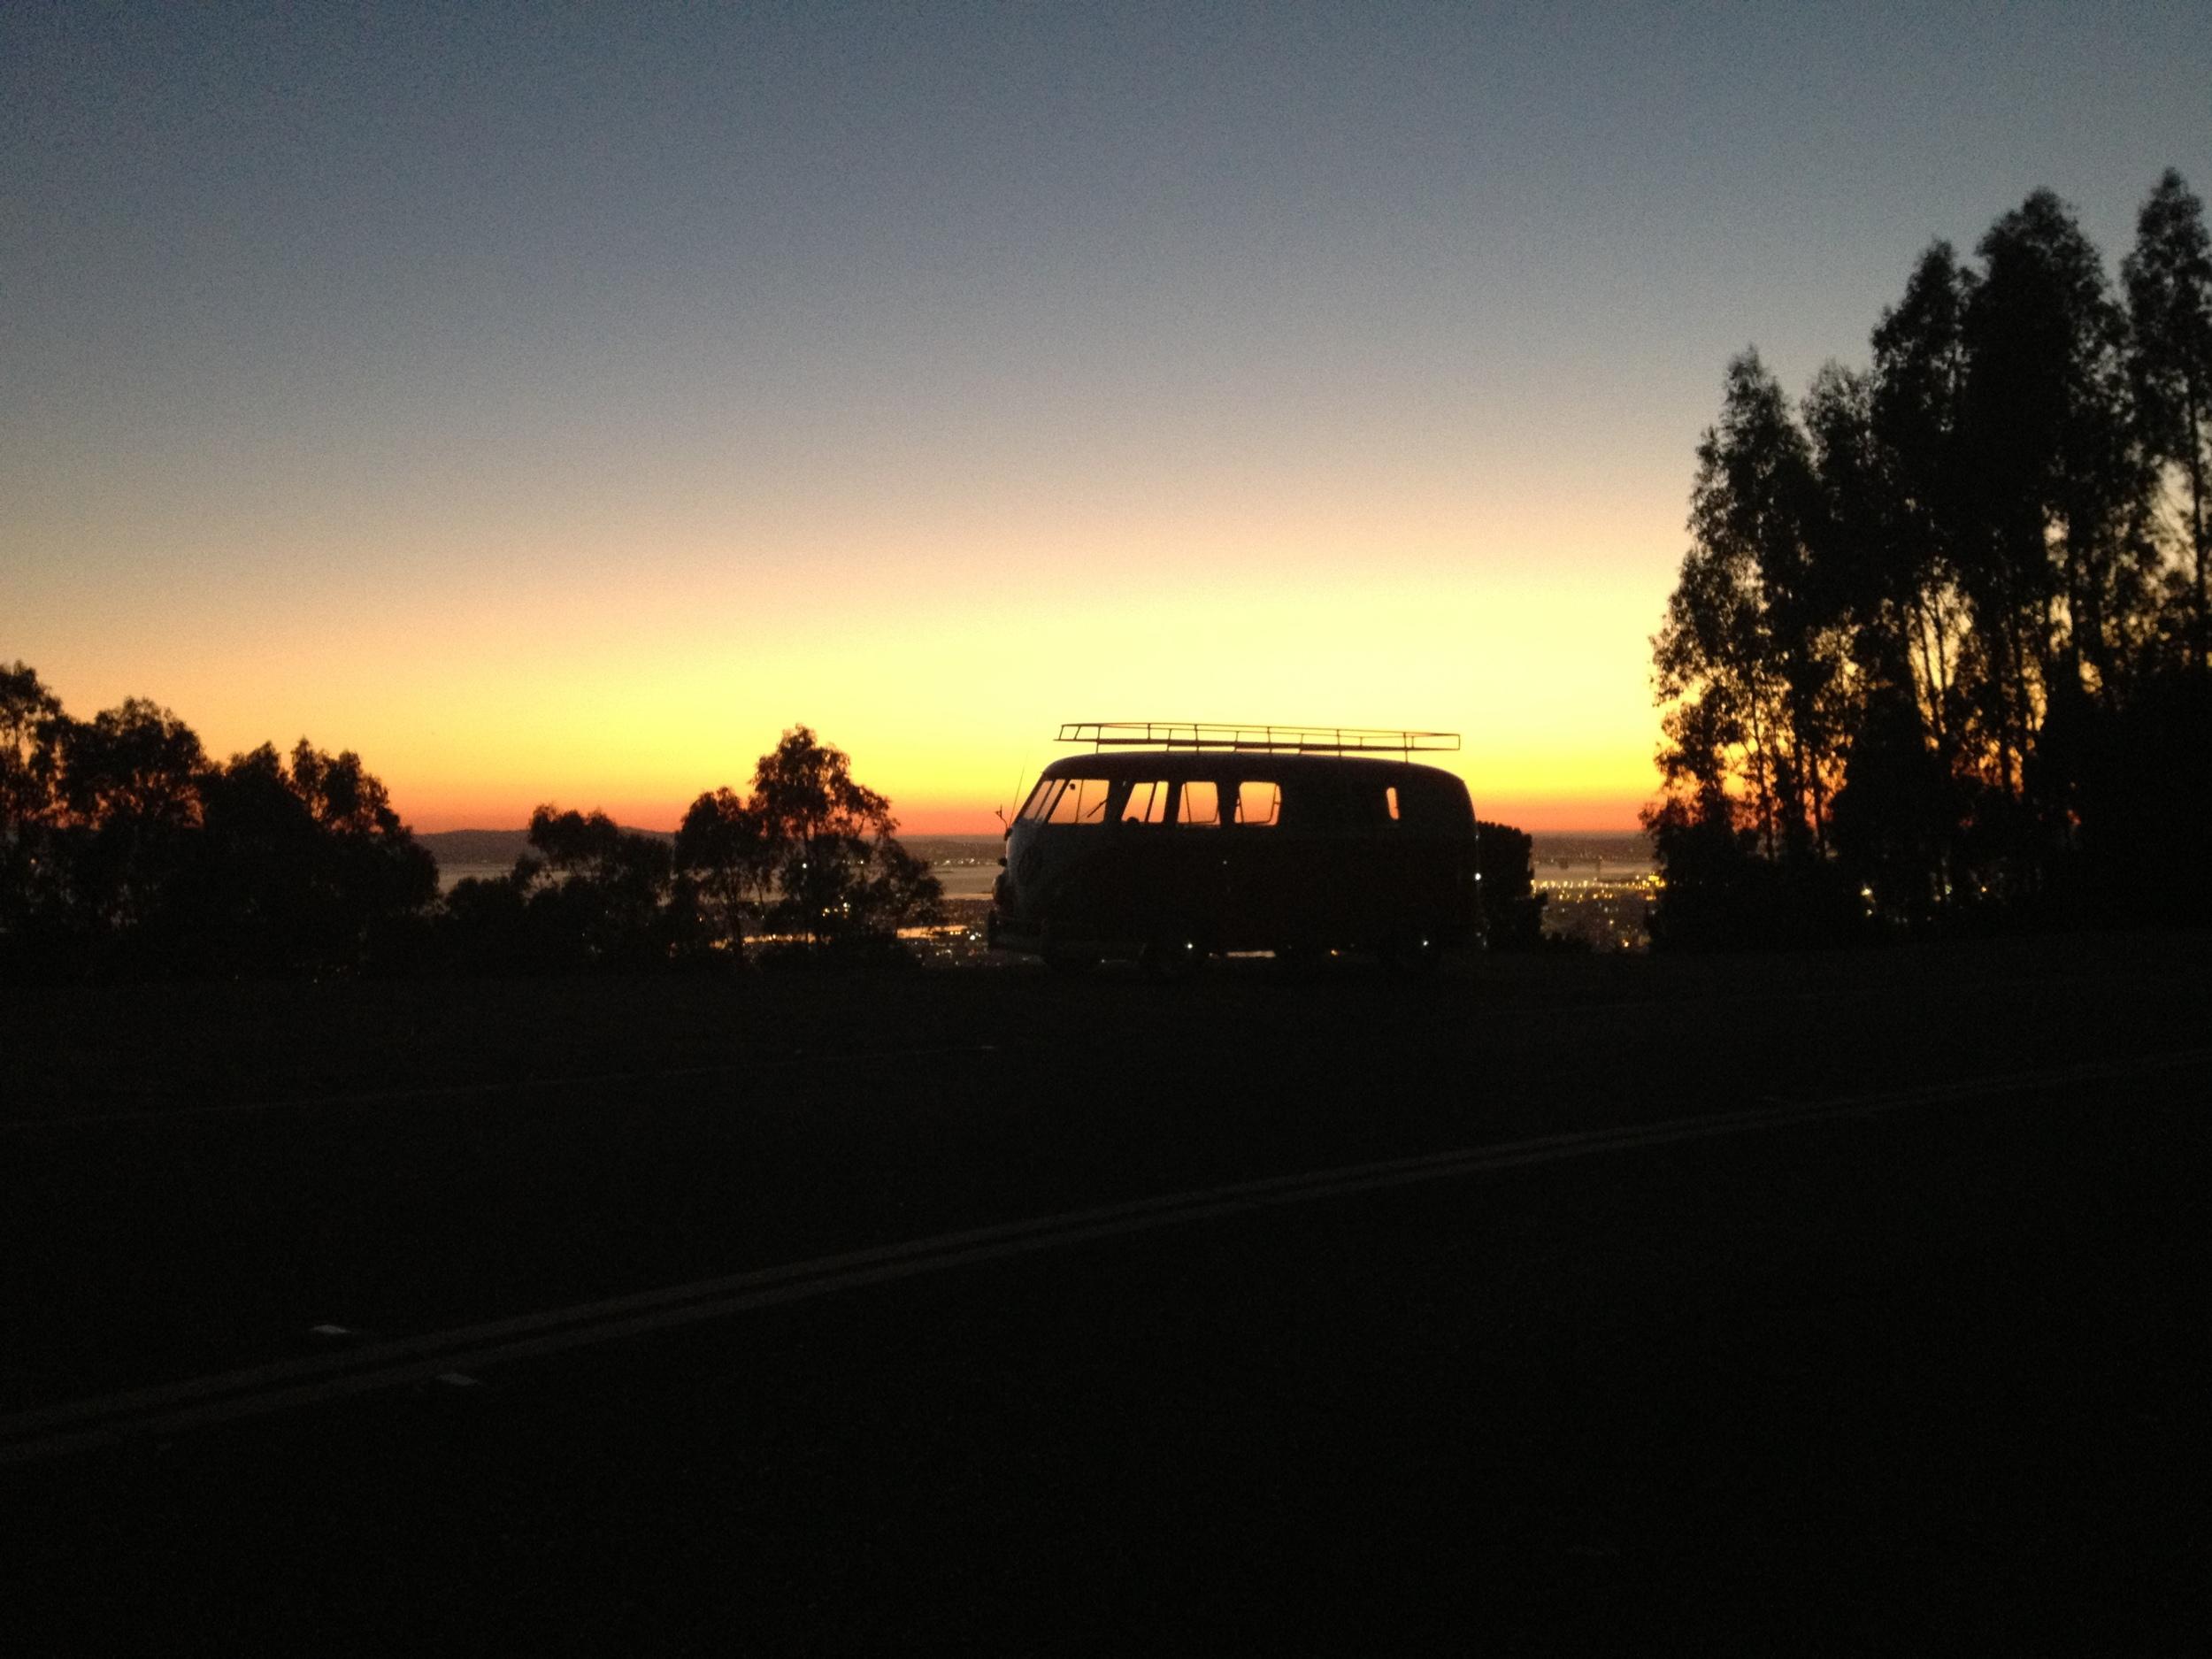 bus sunset.jpg